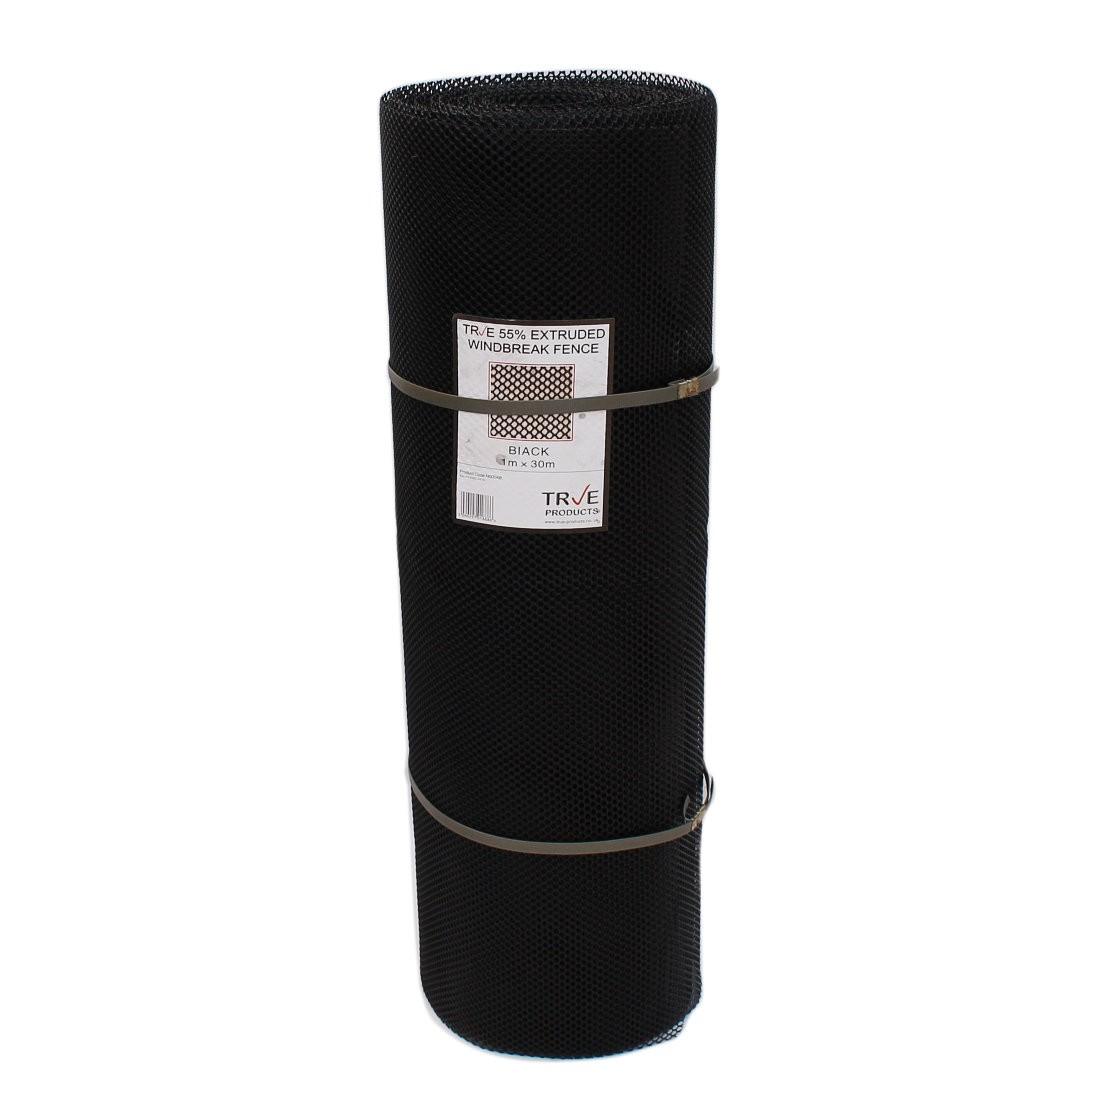 55% Windbreak Extruded Medium Mesh - 30m Roll - 1m High - Black